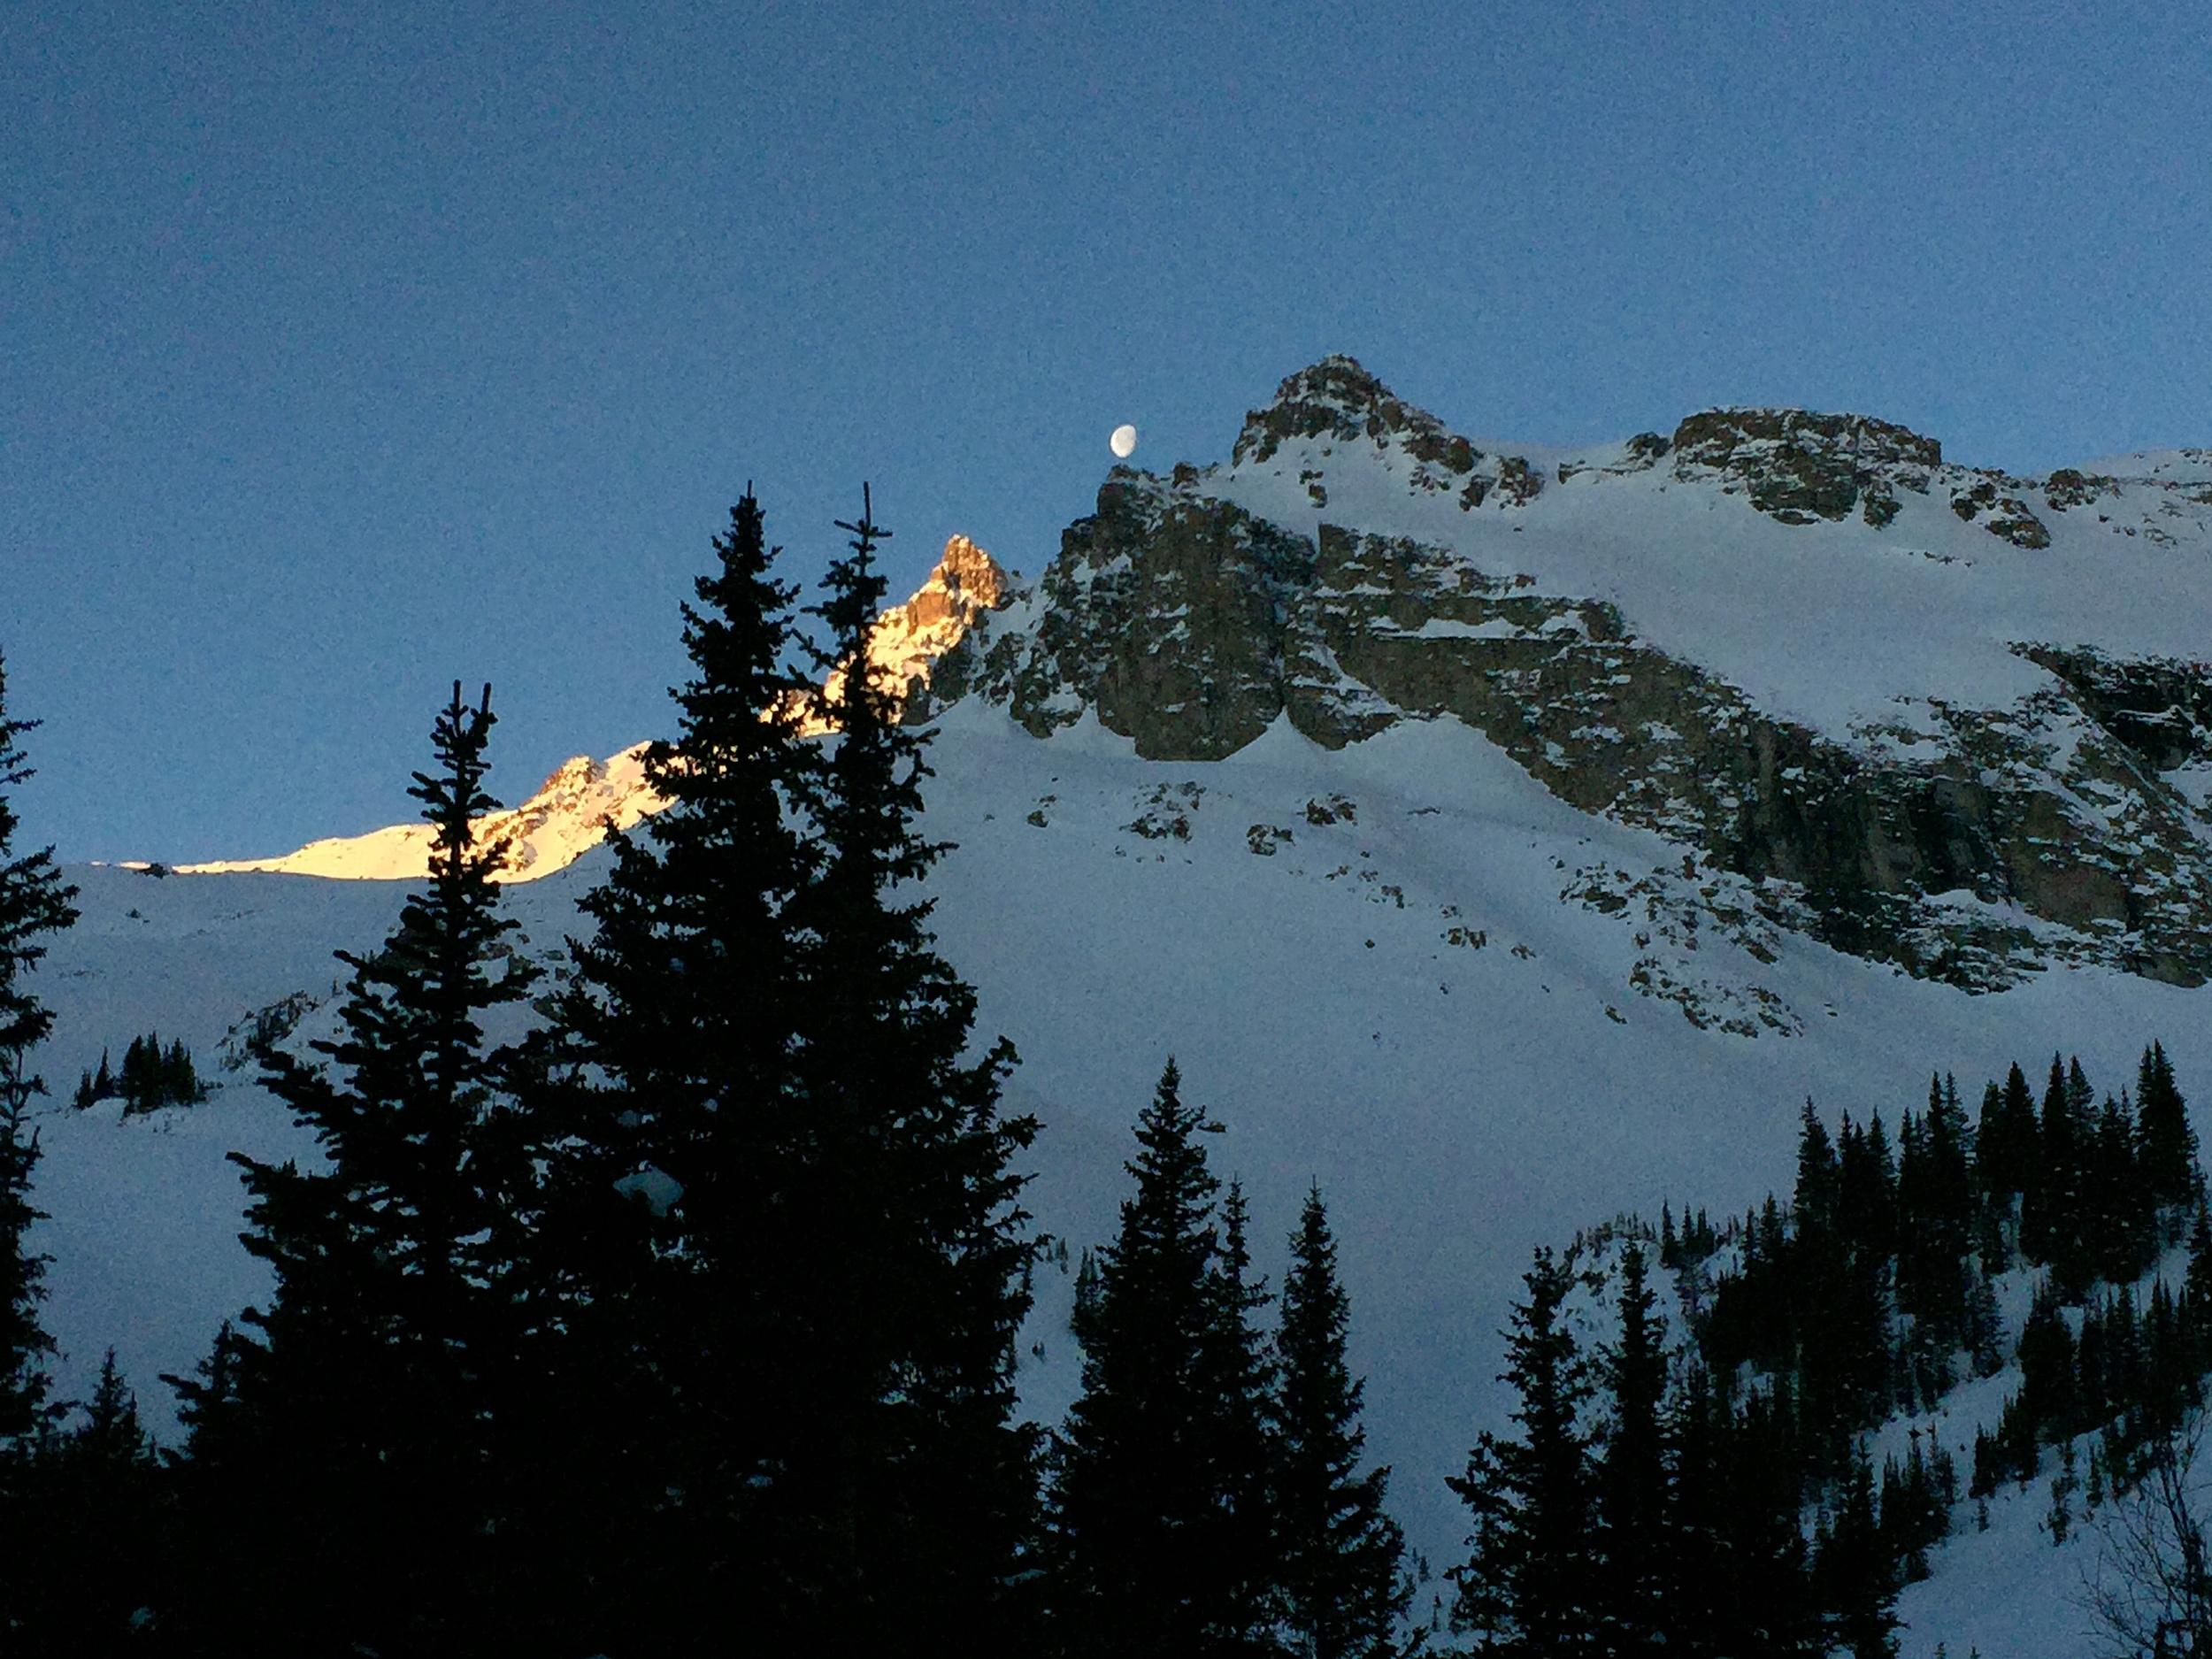 The Moon Sets Behind the Eastern Ridge of 14,278ft. Castle Peak